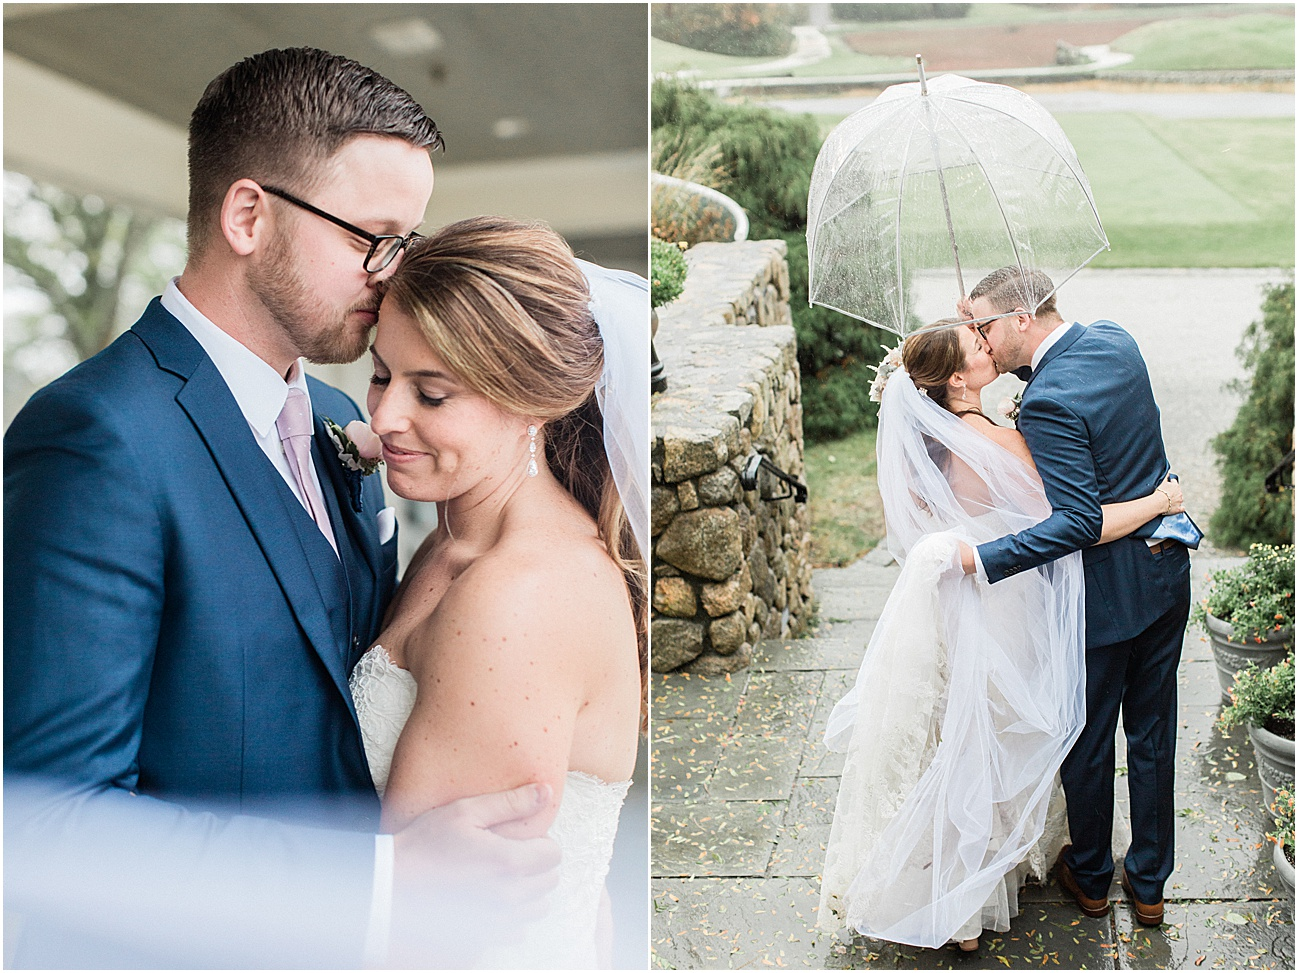 danielle_sean_willowbend_rain_rainy_day_cape_cod_boston_wedding_photographer_meredith_jane_photography_photo_1692.jpg